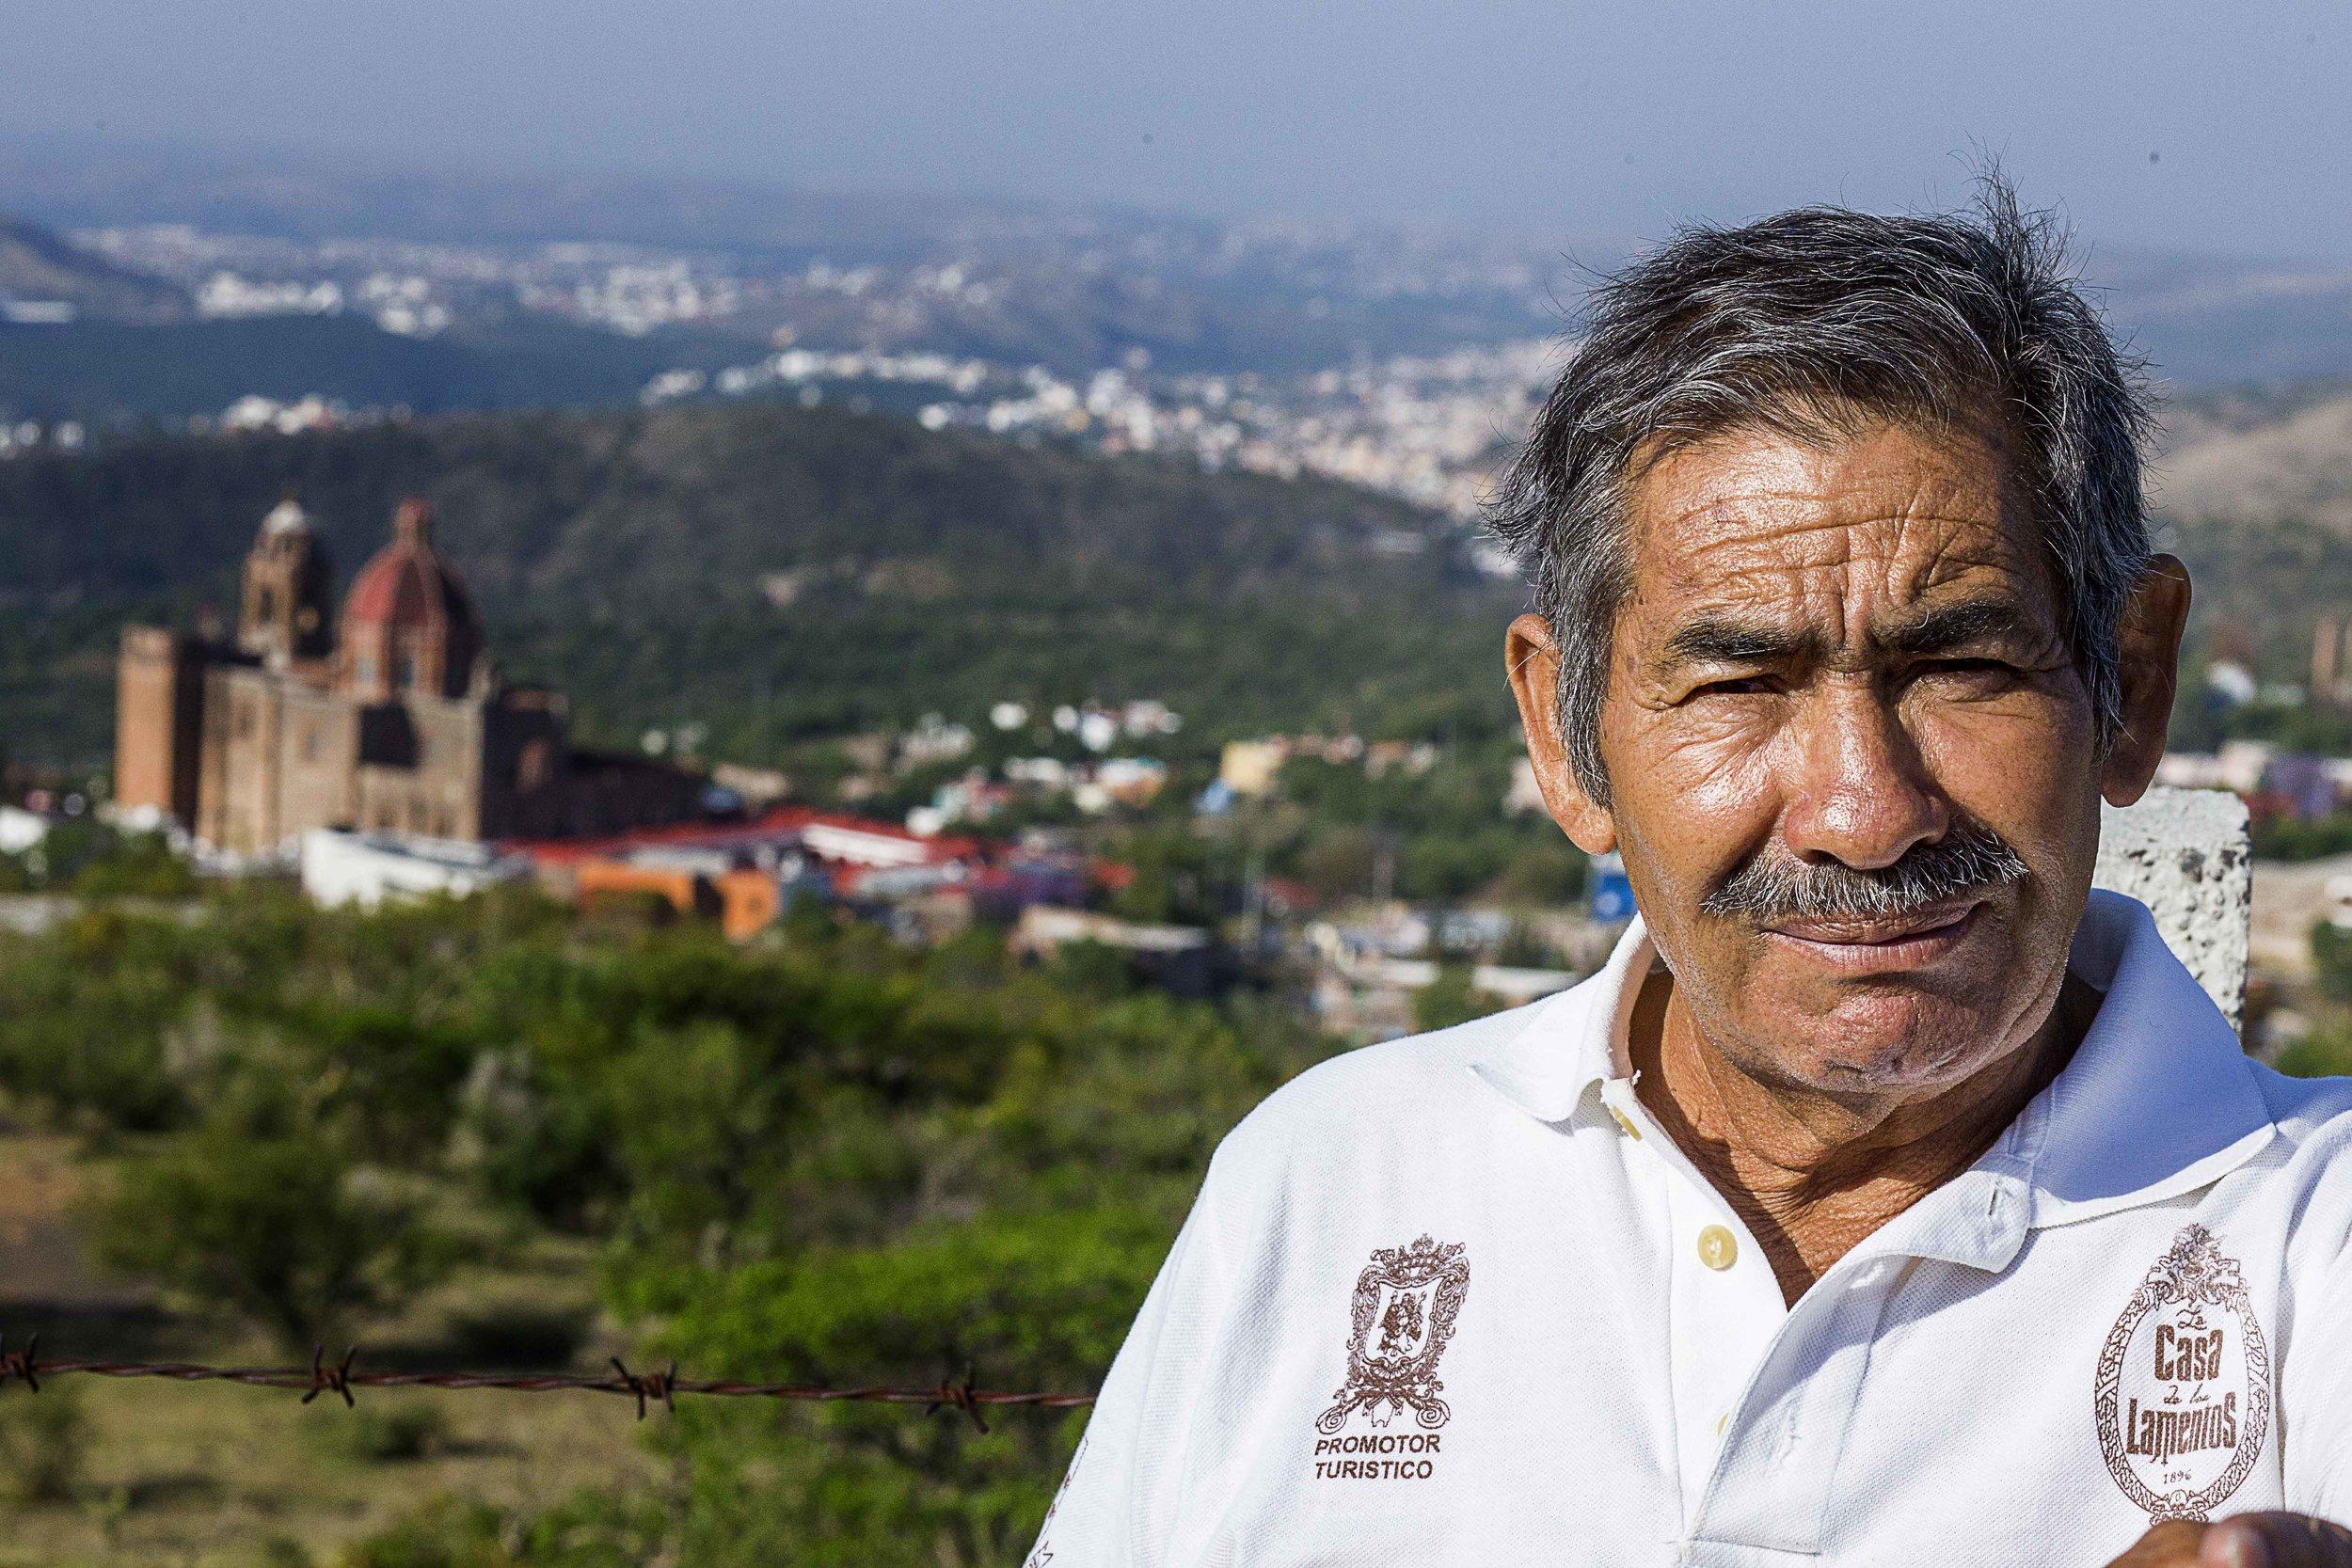 IMG_6305_Guanajuato_LR.jpg